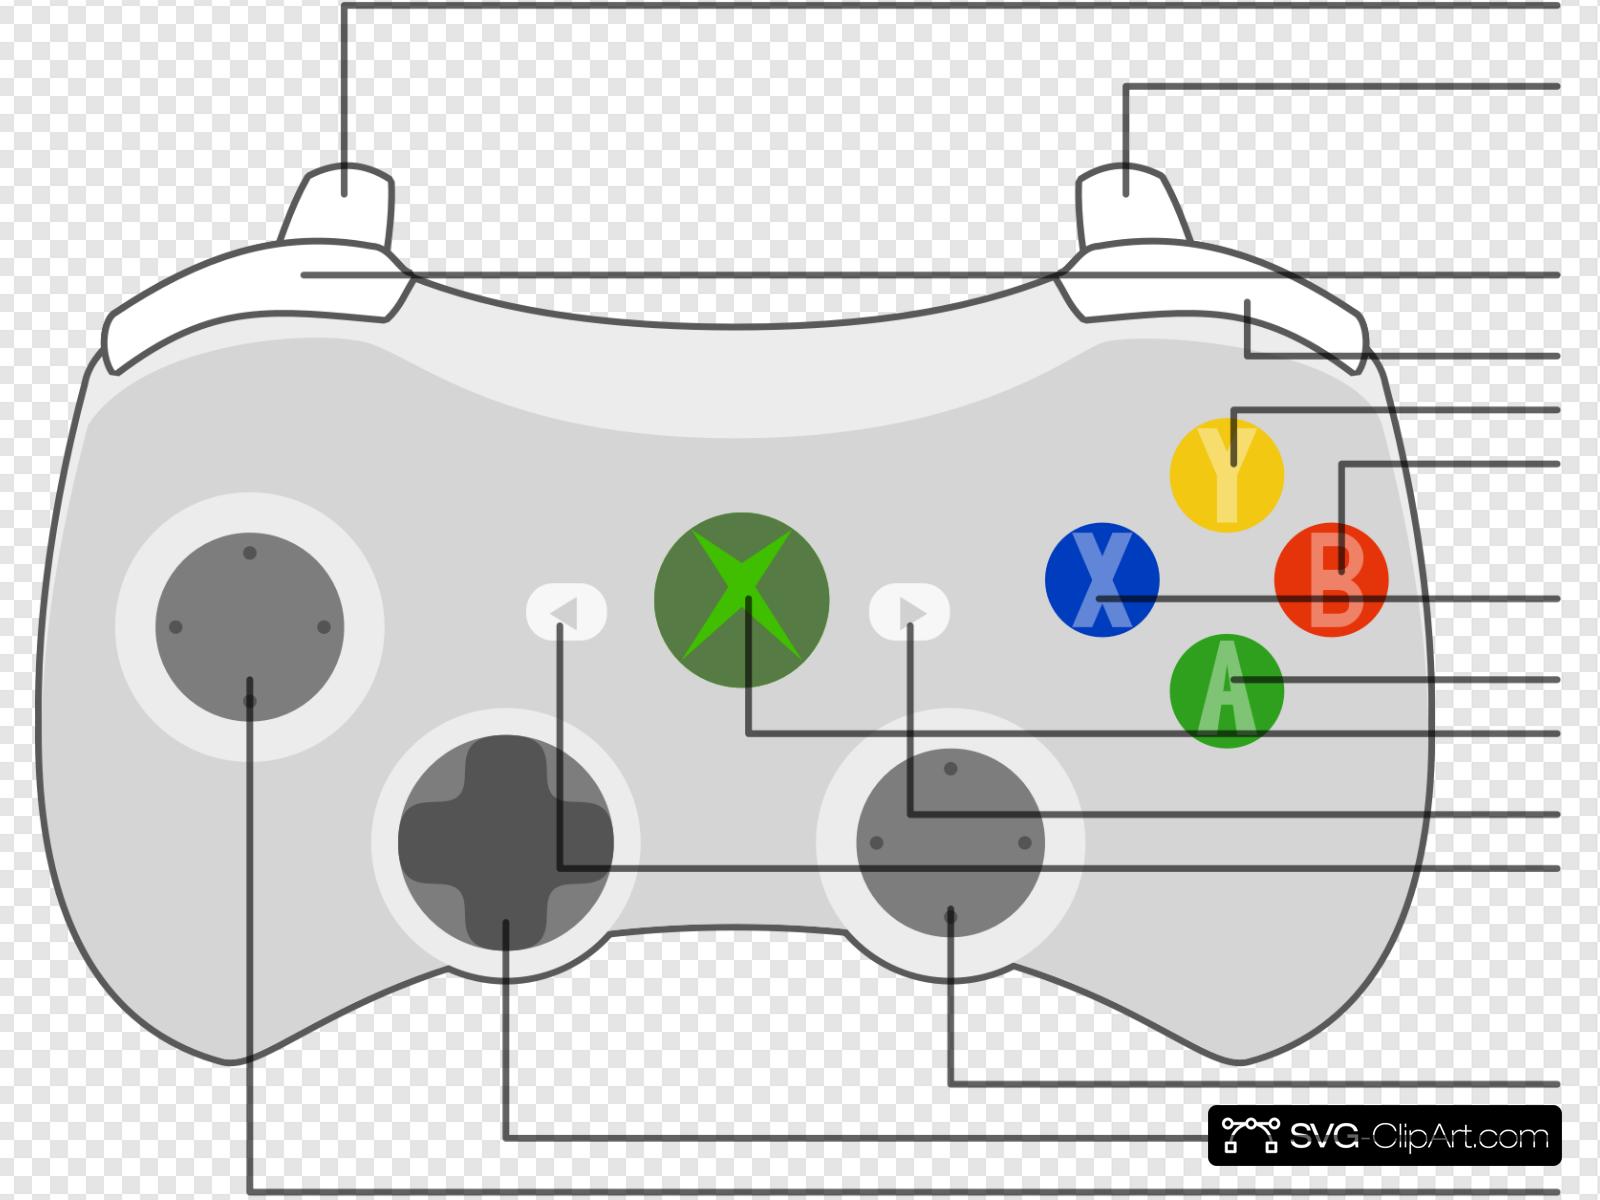 Xbox 360 Controller Diagram Clip art, Icon and SVG.